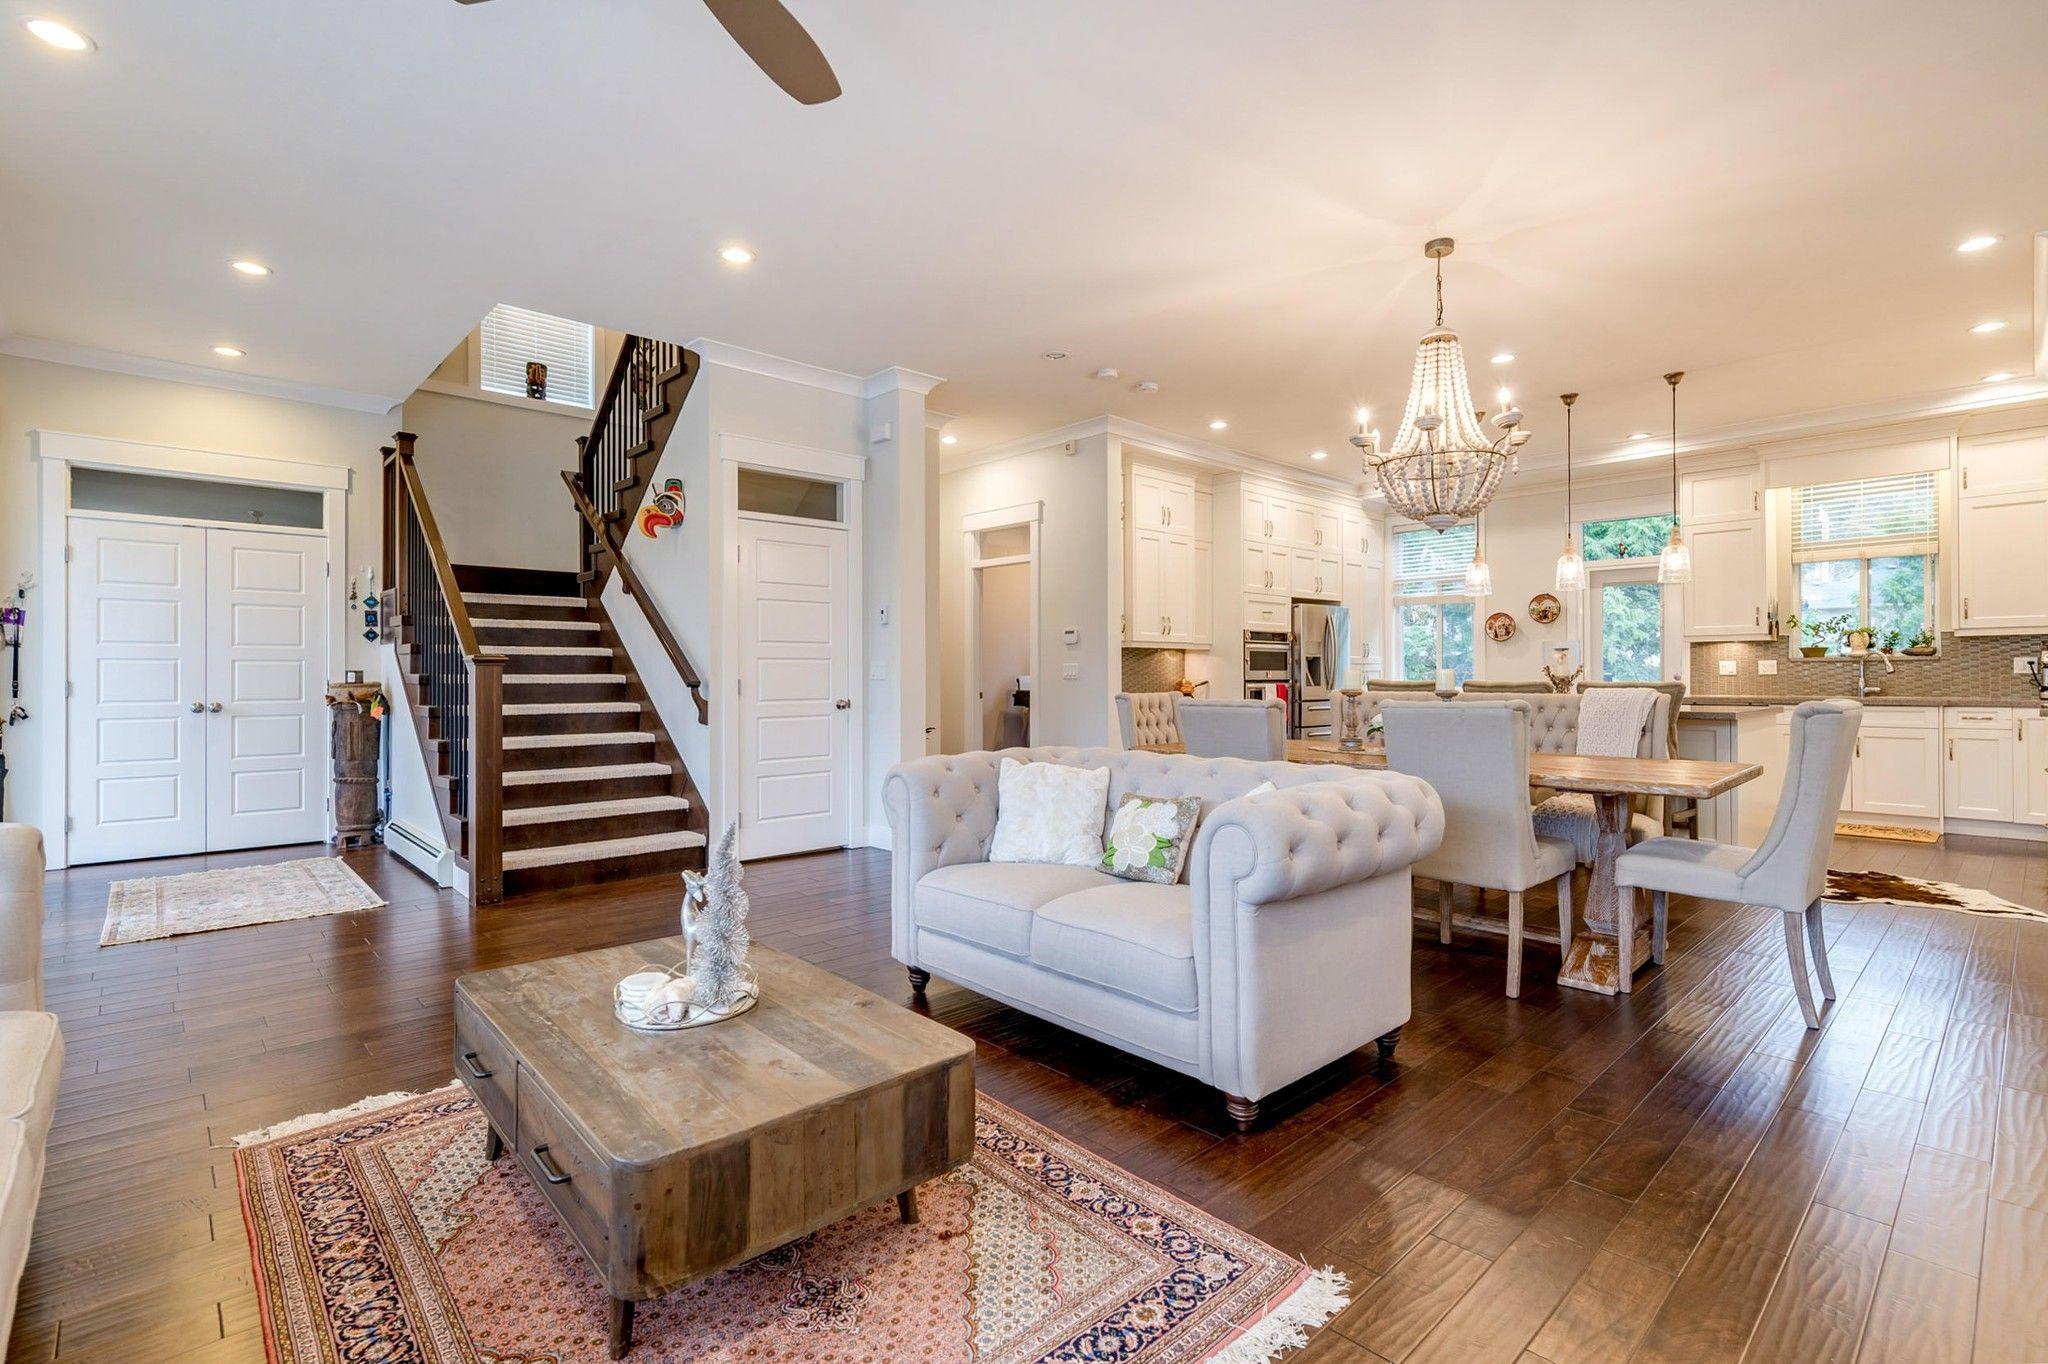 Photo 3: Photos: 1303 Hollybrook Street in Coquitlam: Burke Mountain House for sale : MLS®# R2423196